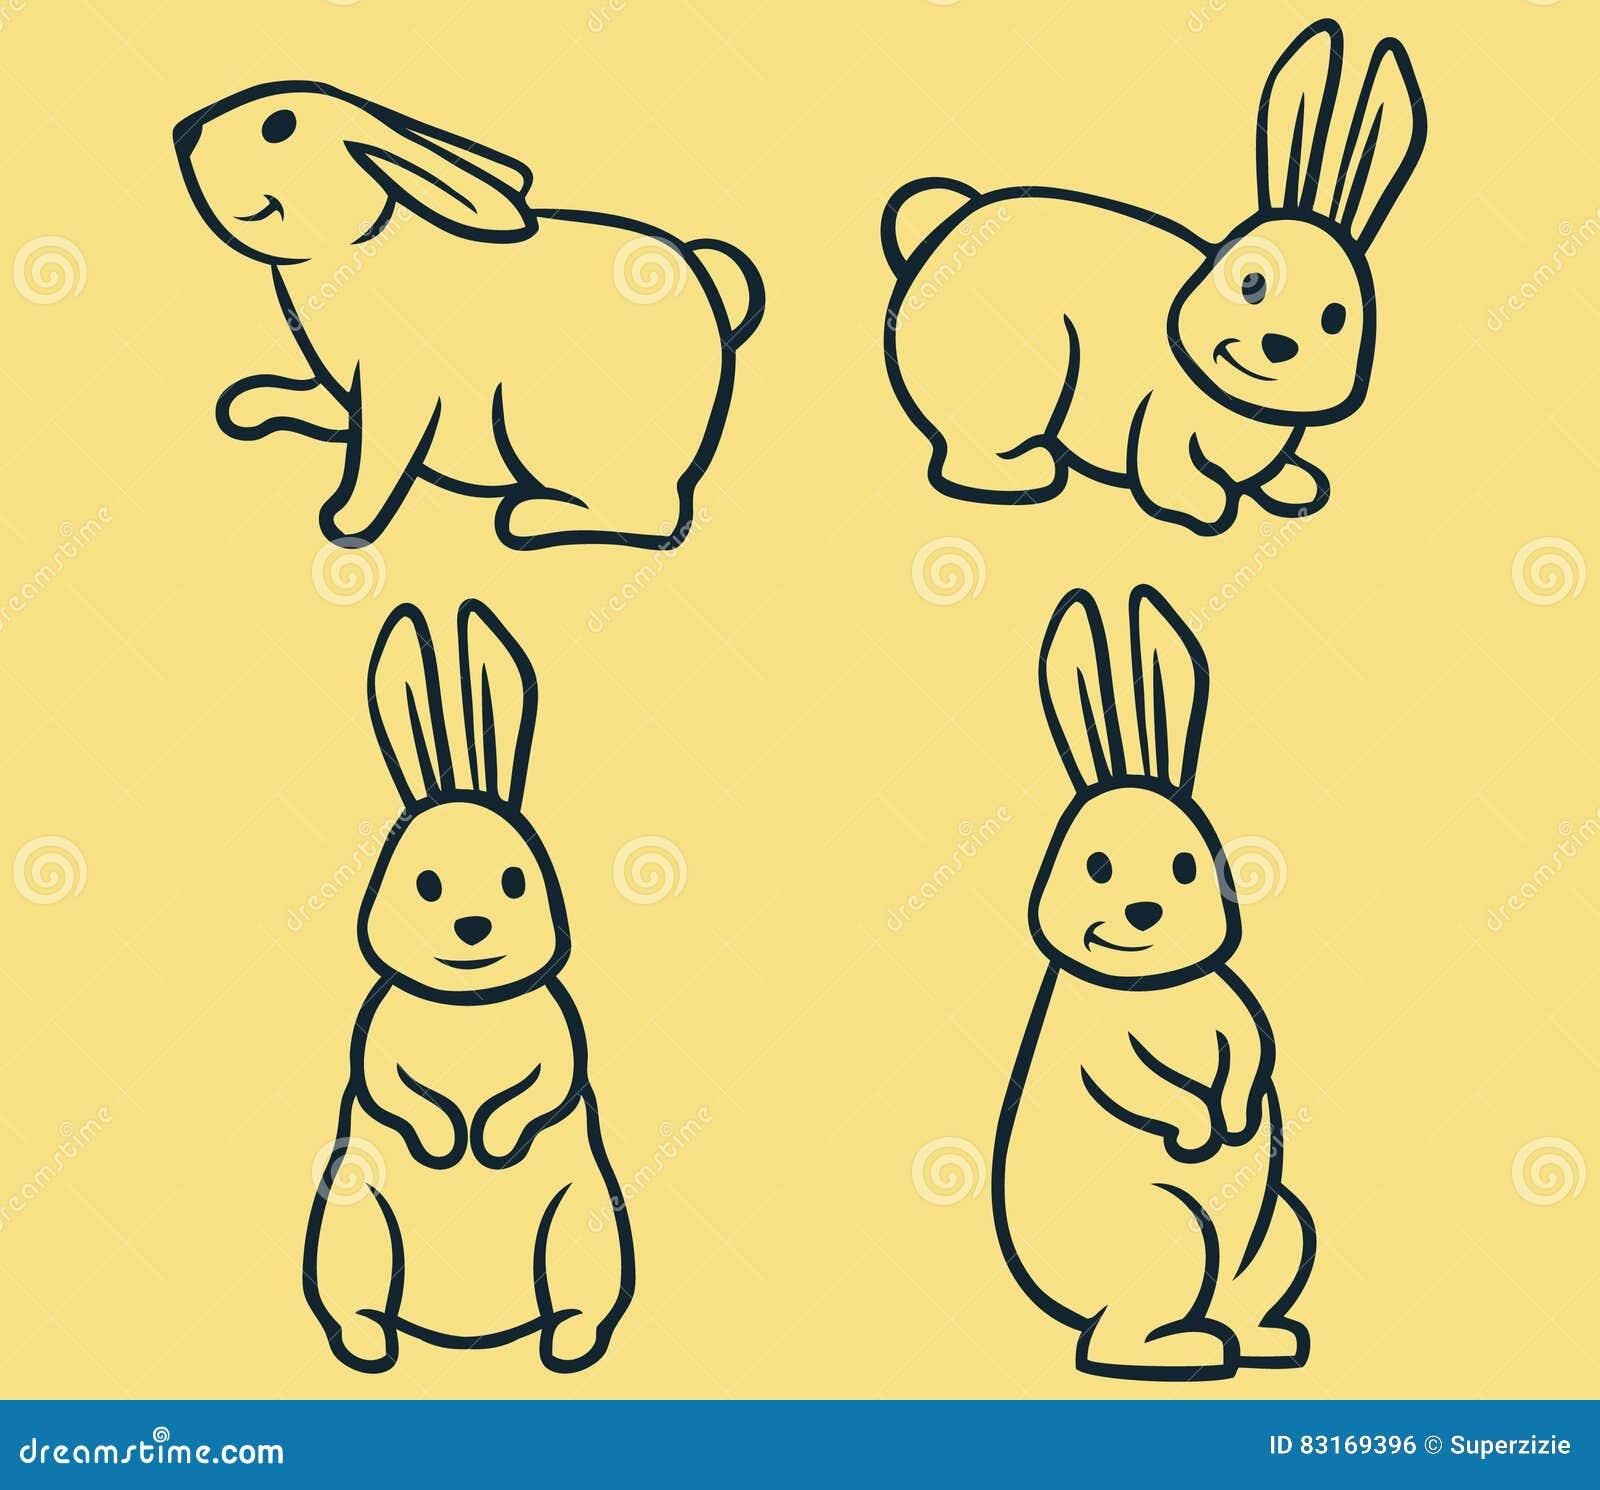 Line Art Vector Illustrator : Rabbit line art stock vector image